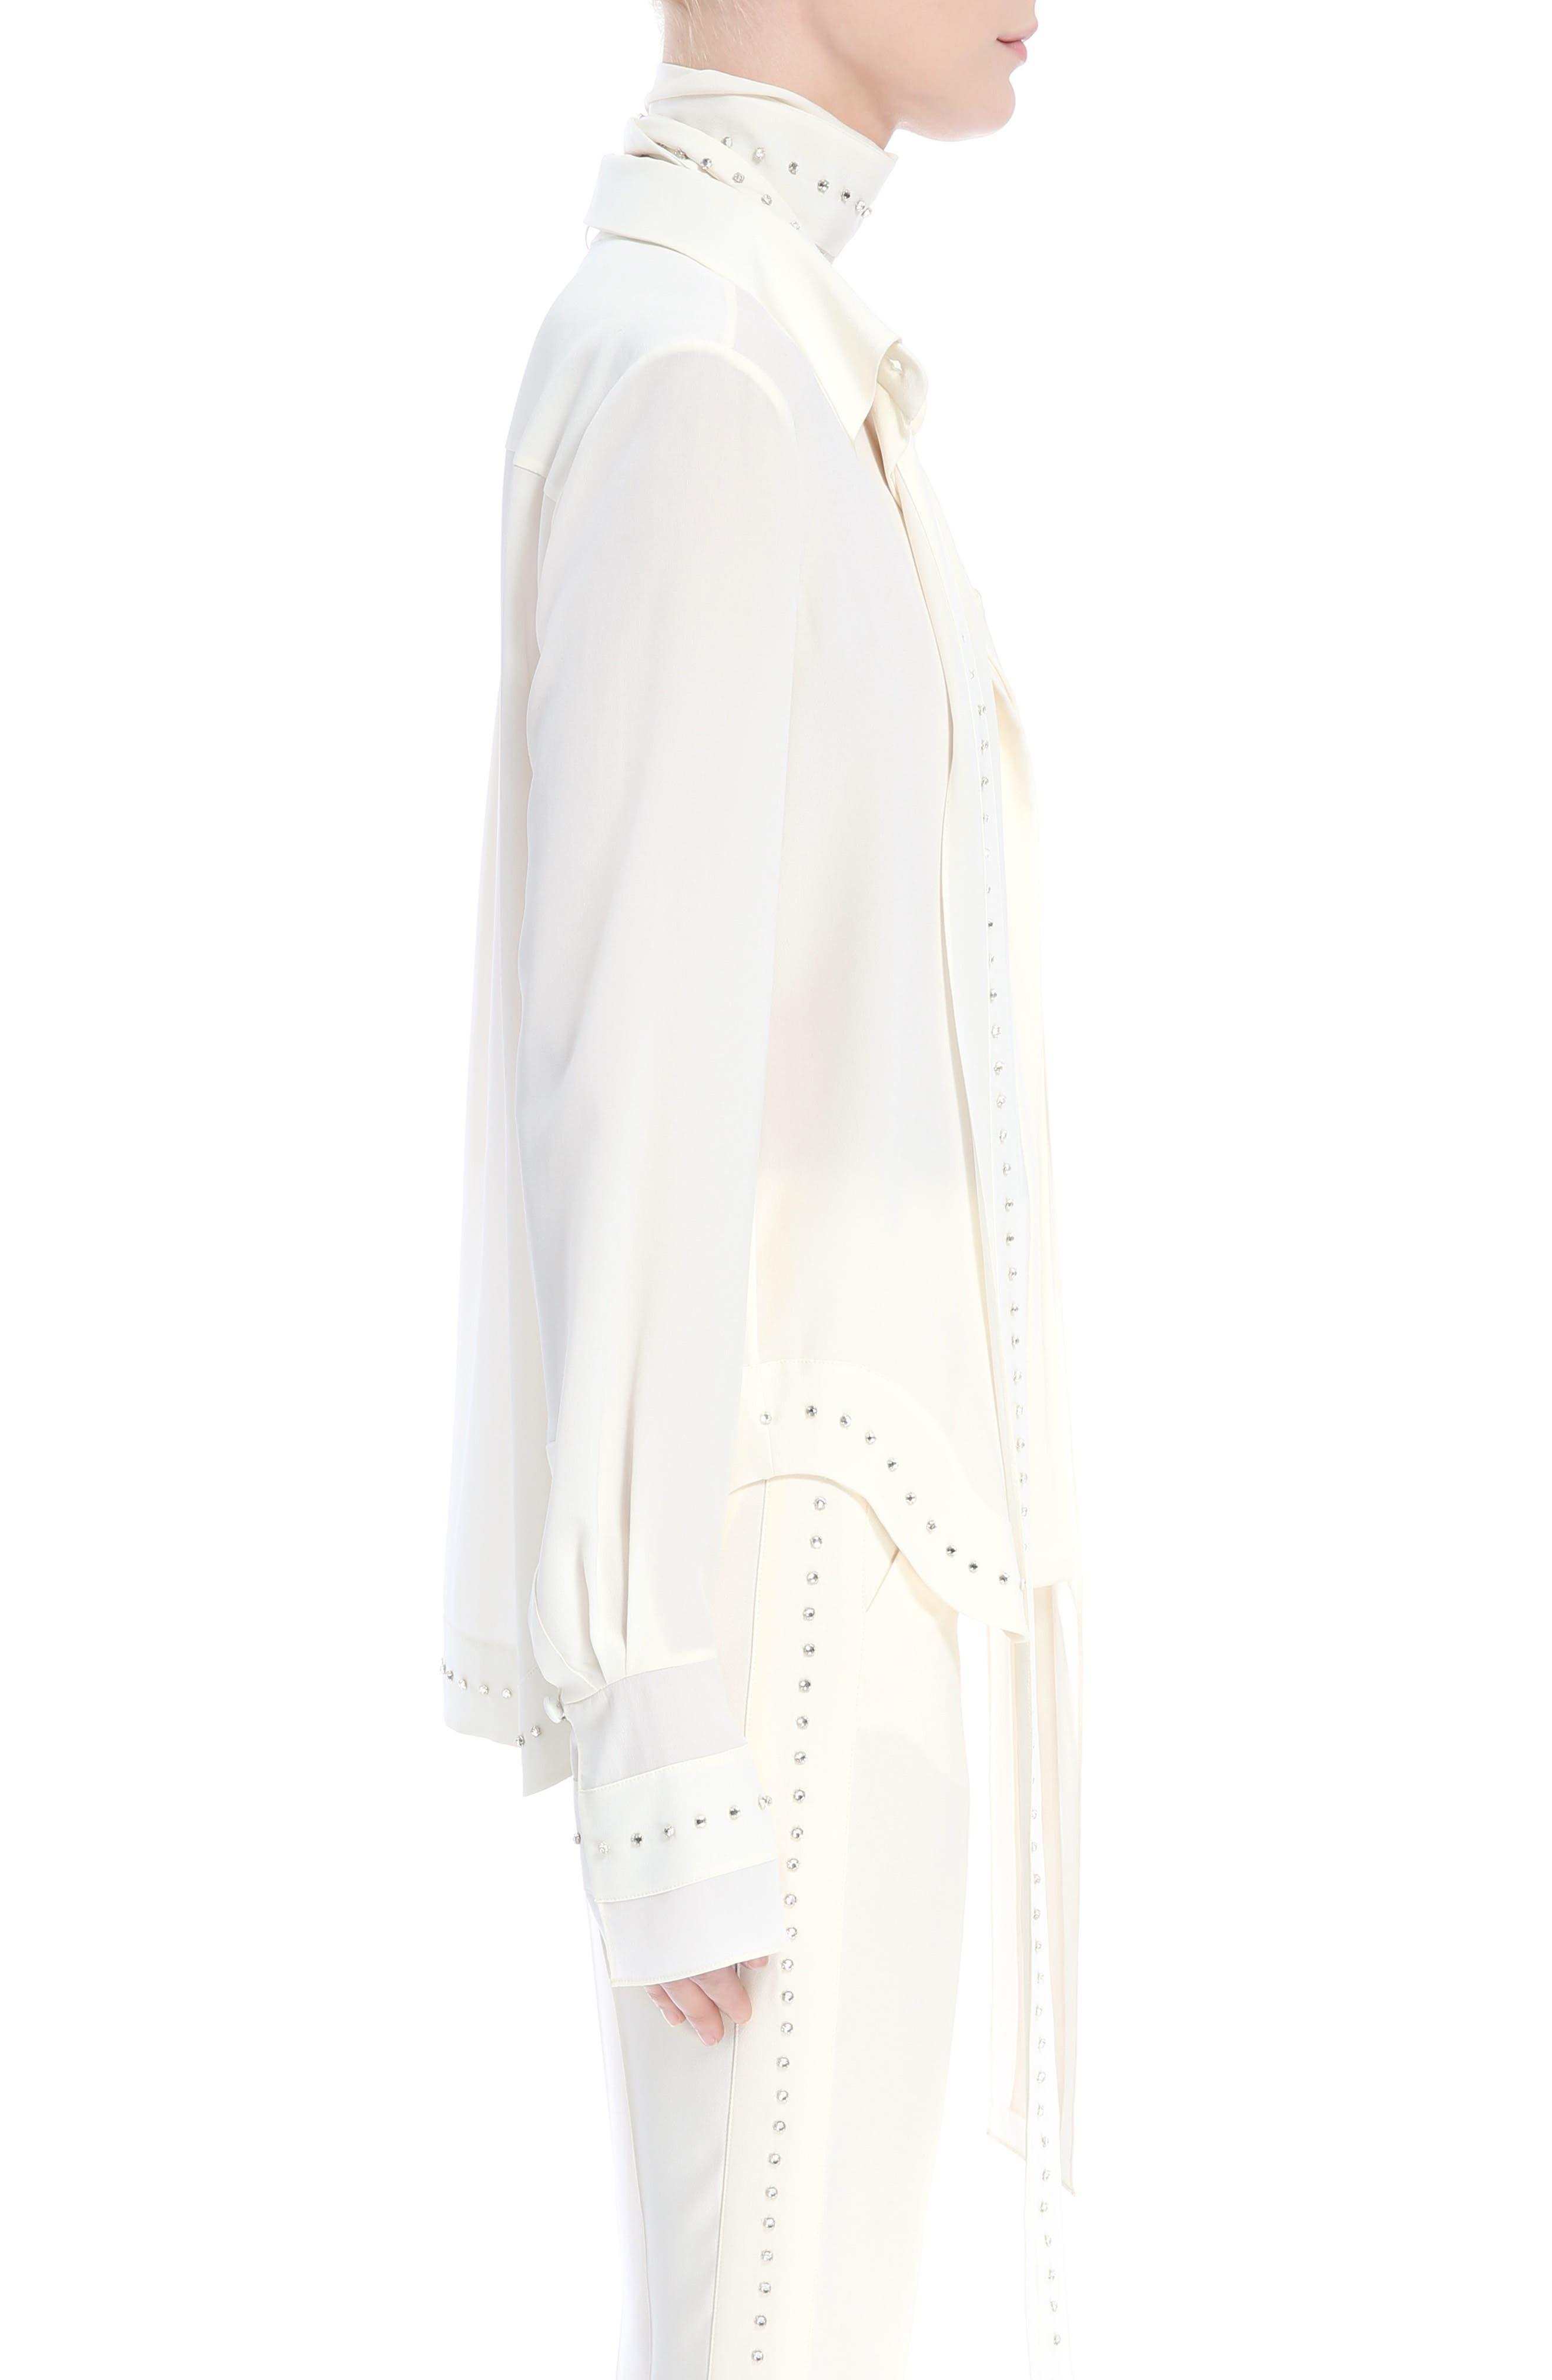 Rhinstone Trim Silk Shirt with Scarf,                             Alternate thumbnail 3, color,                             101